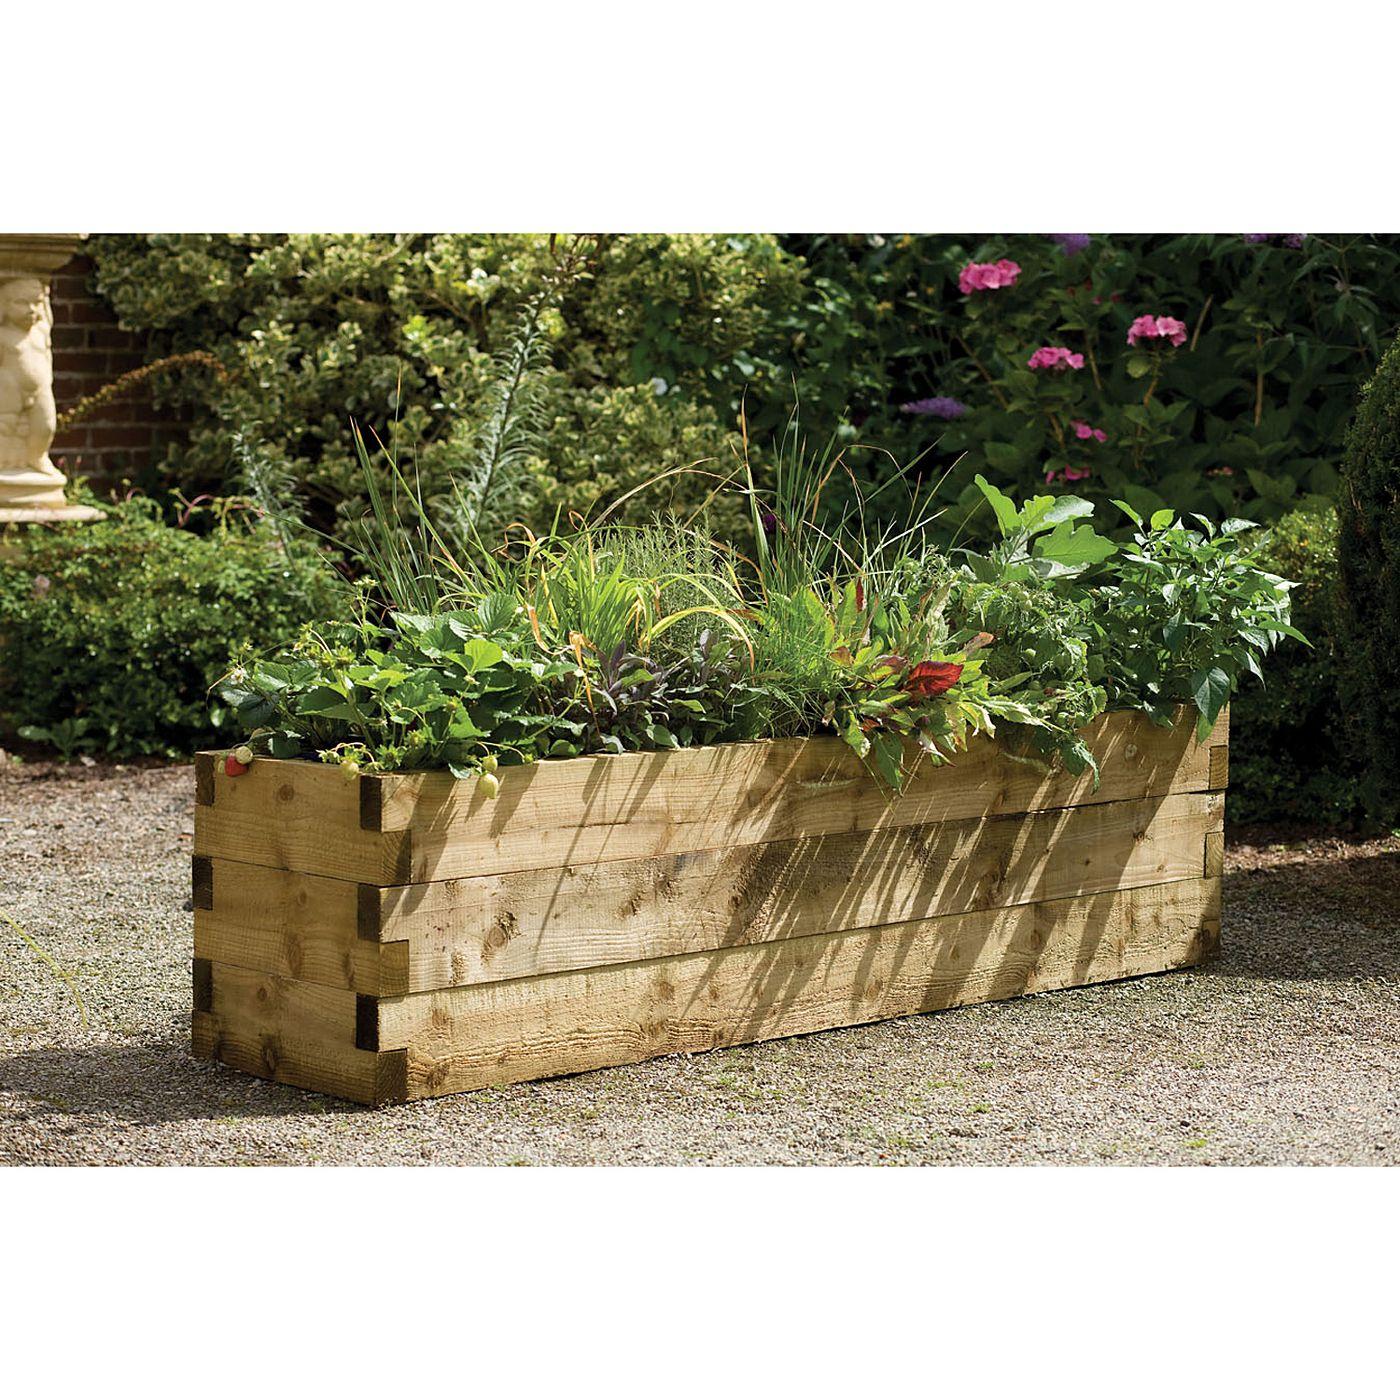 Larchlap Caledonian Planter 45 x 180 x 45 cm Garden